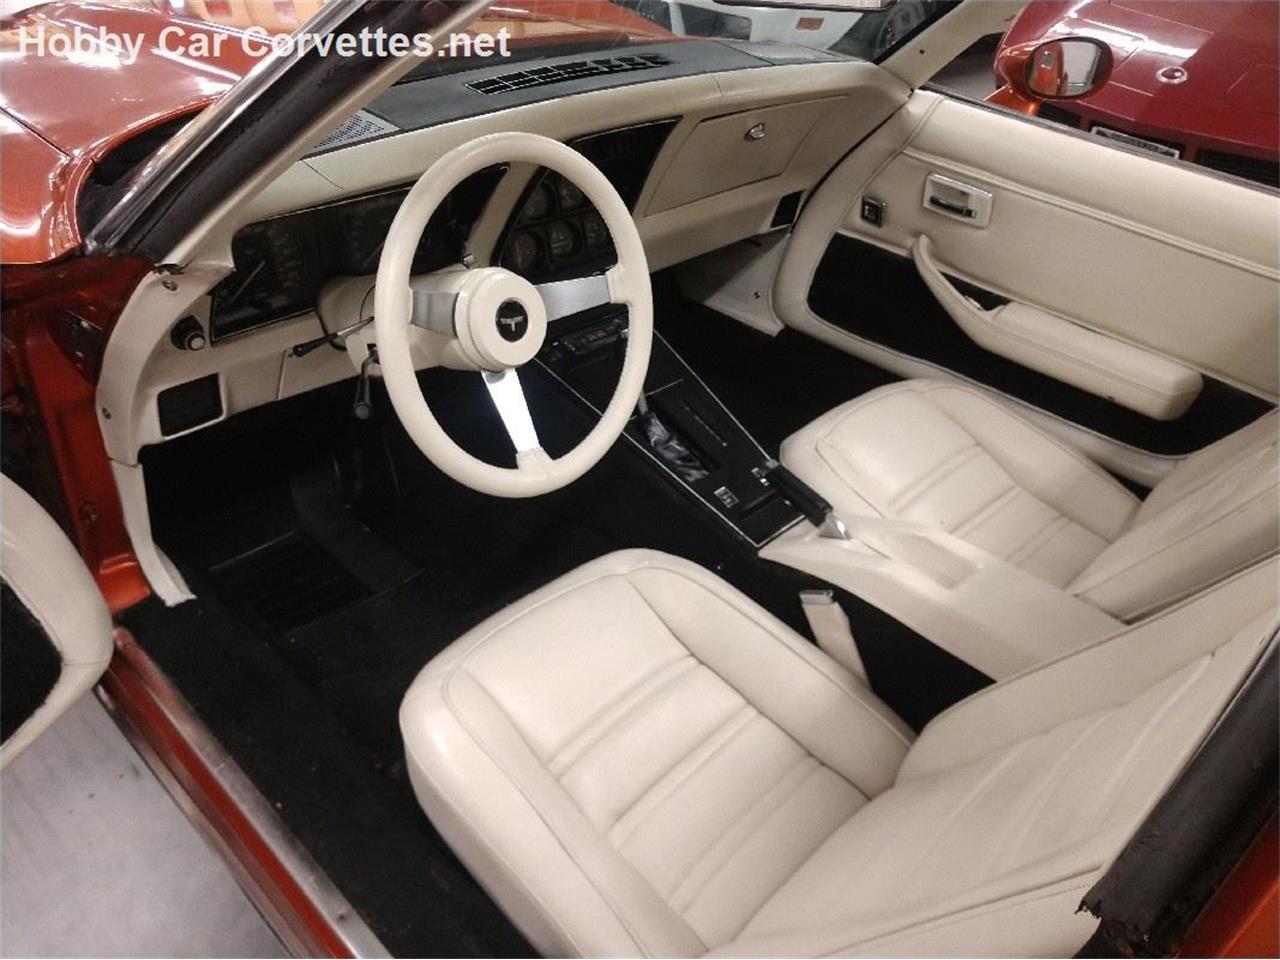 1979 Chevrolet Corvette (CC-1361476) for sale in martinsburg, Pennsylvania